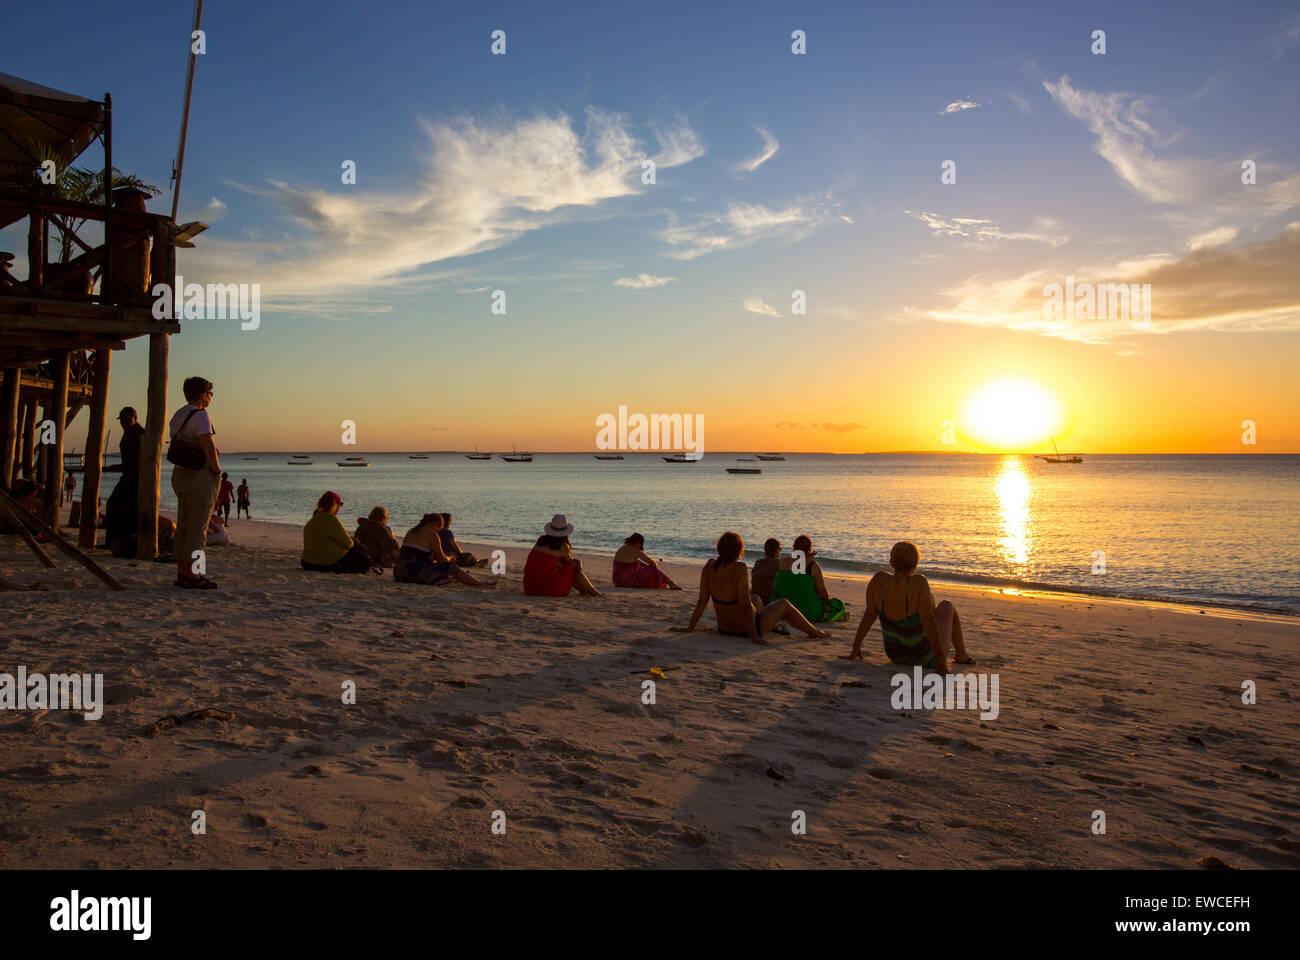 Tourists Watch The Sunset On Nungwi Beach Zanzibar